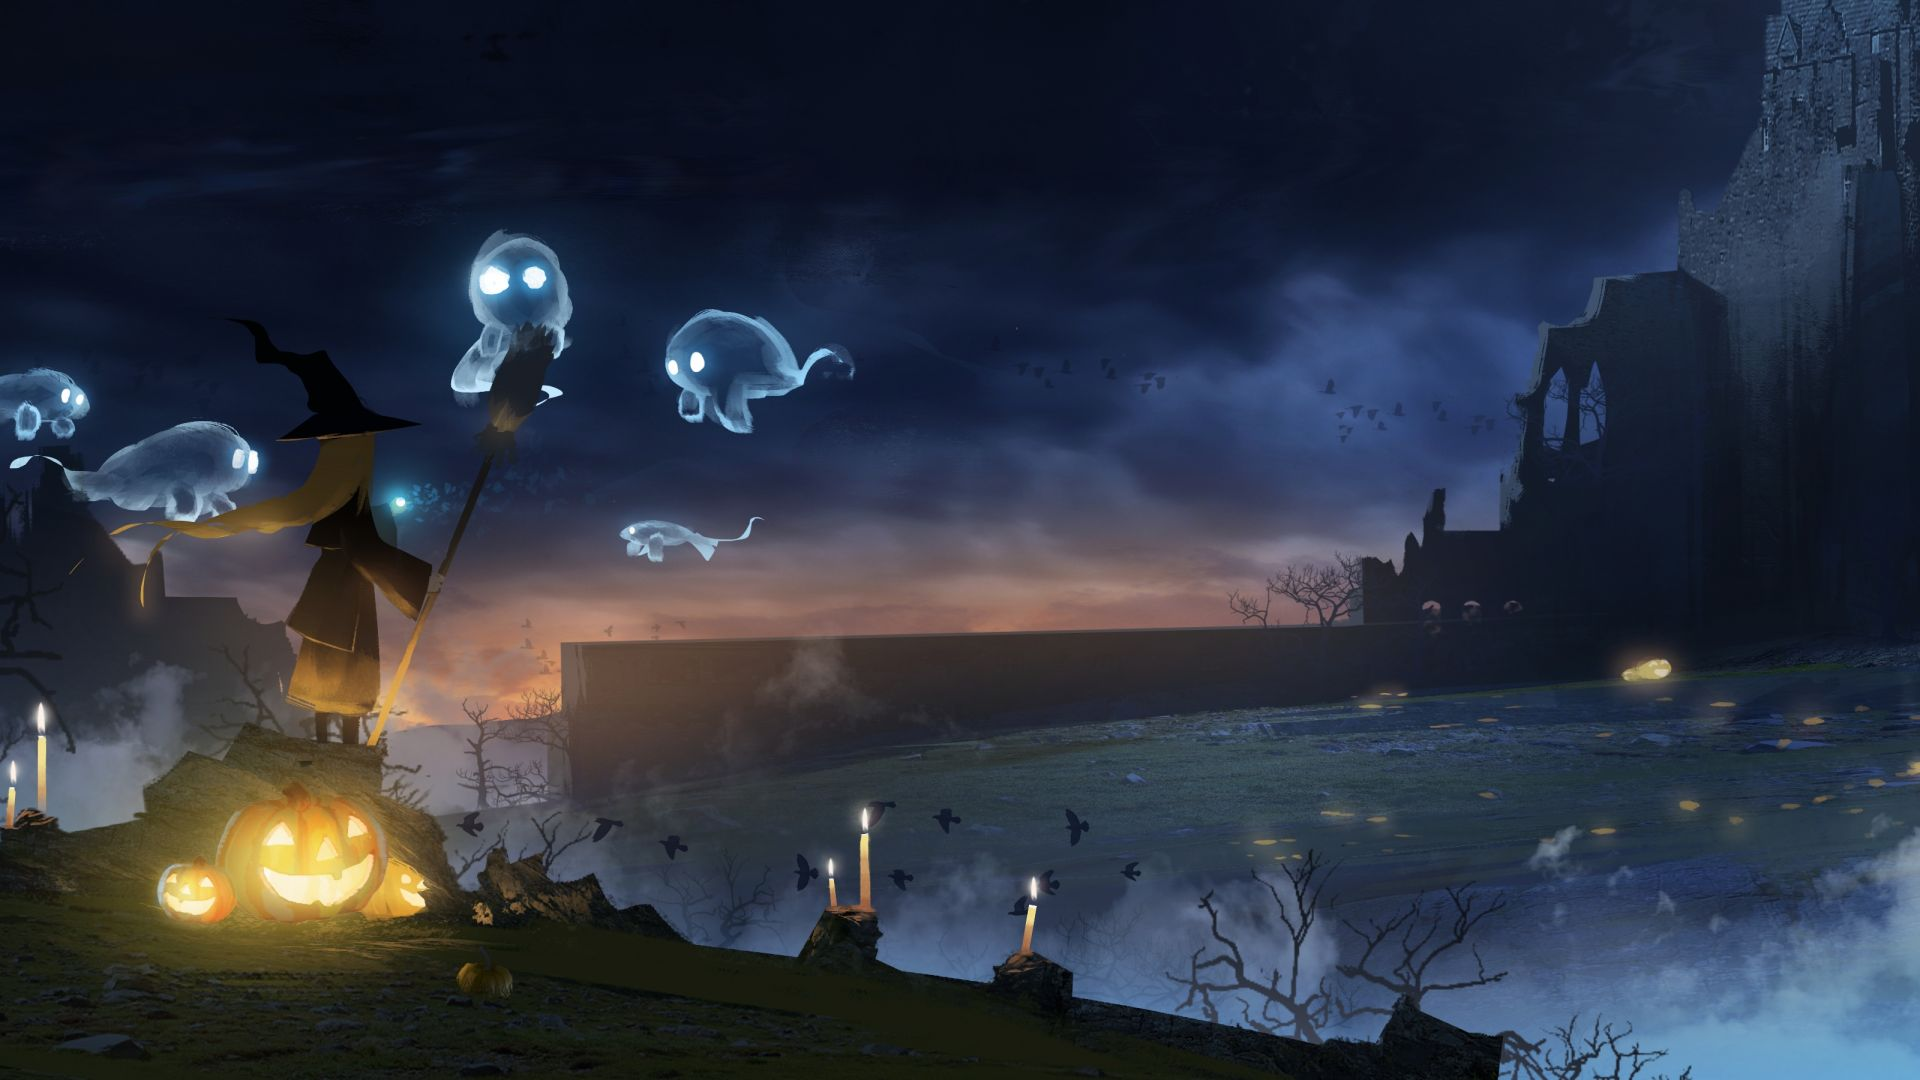 Wallpaper Witch, anime girl, ghost, halloween, night, 4k